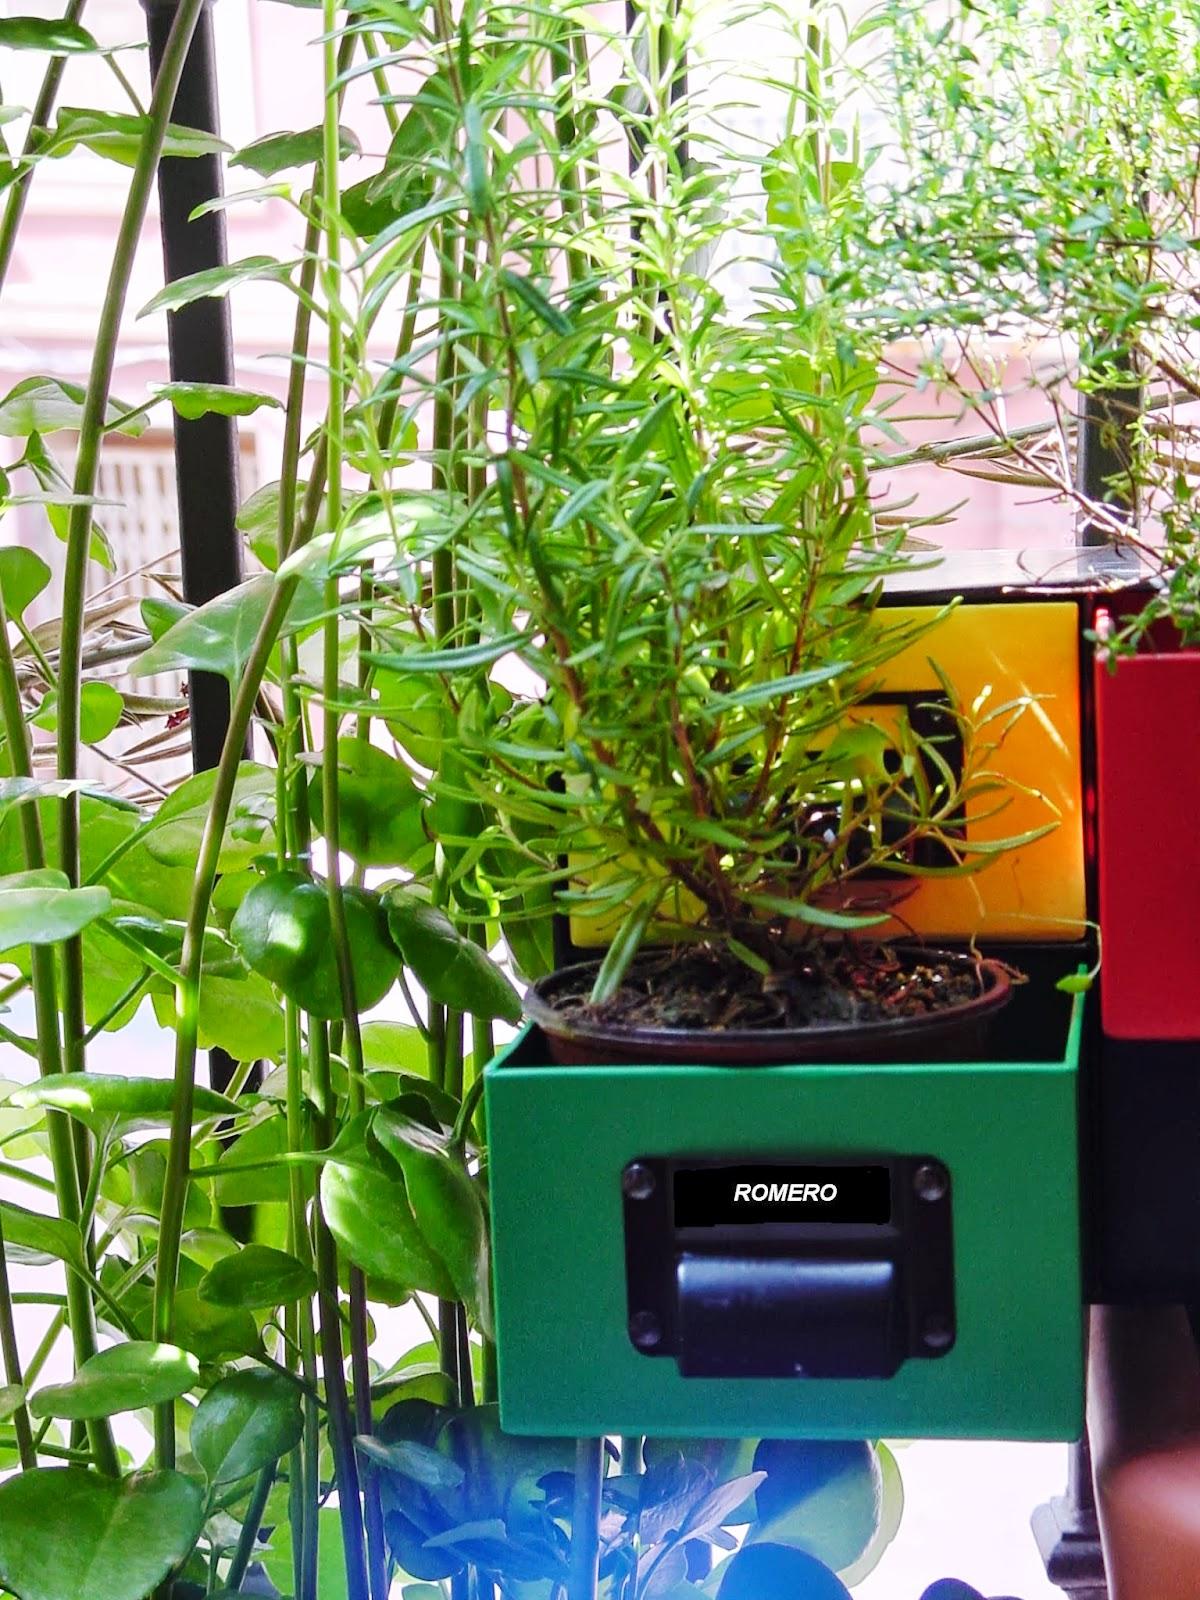 Jardineria eladio nonay romero jardiner a eladio nonay - Jardineria eladio nonay ...